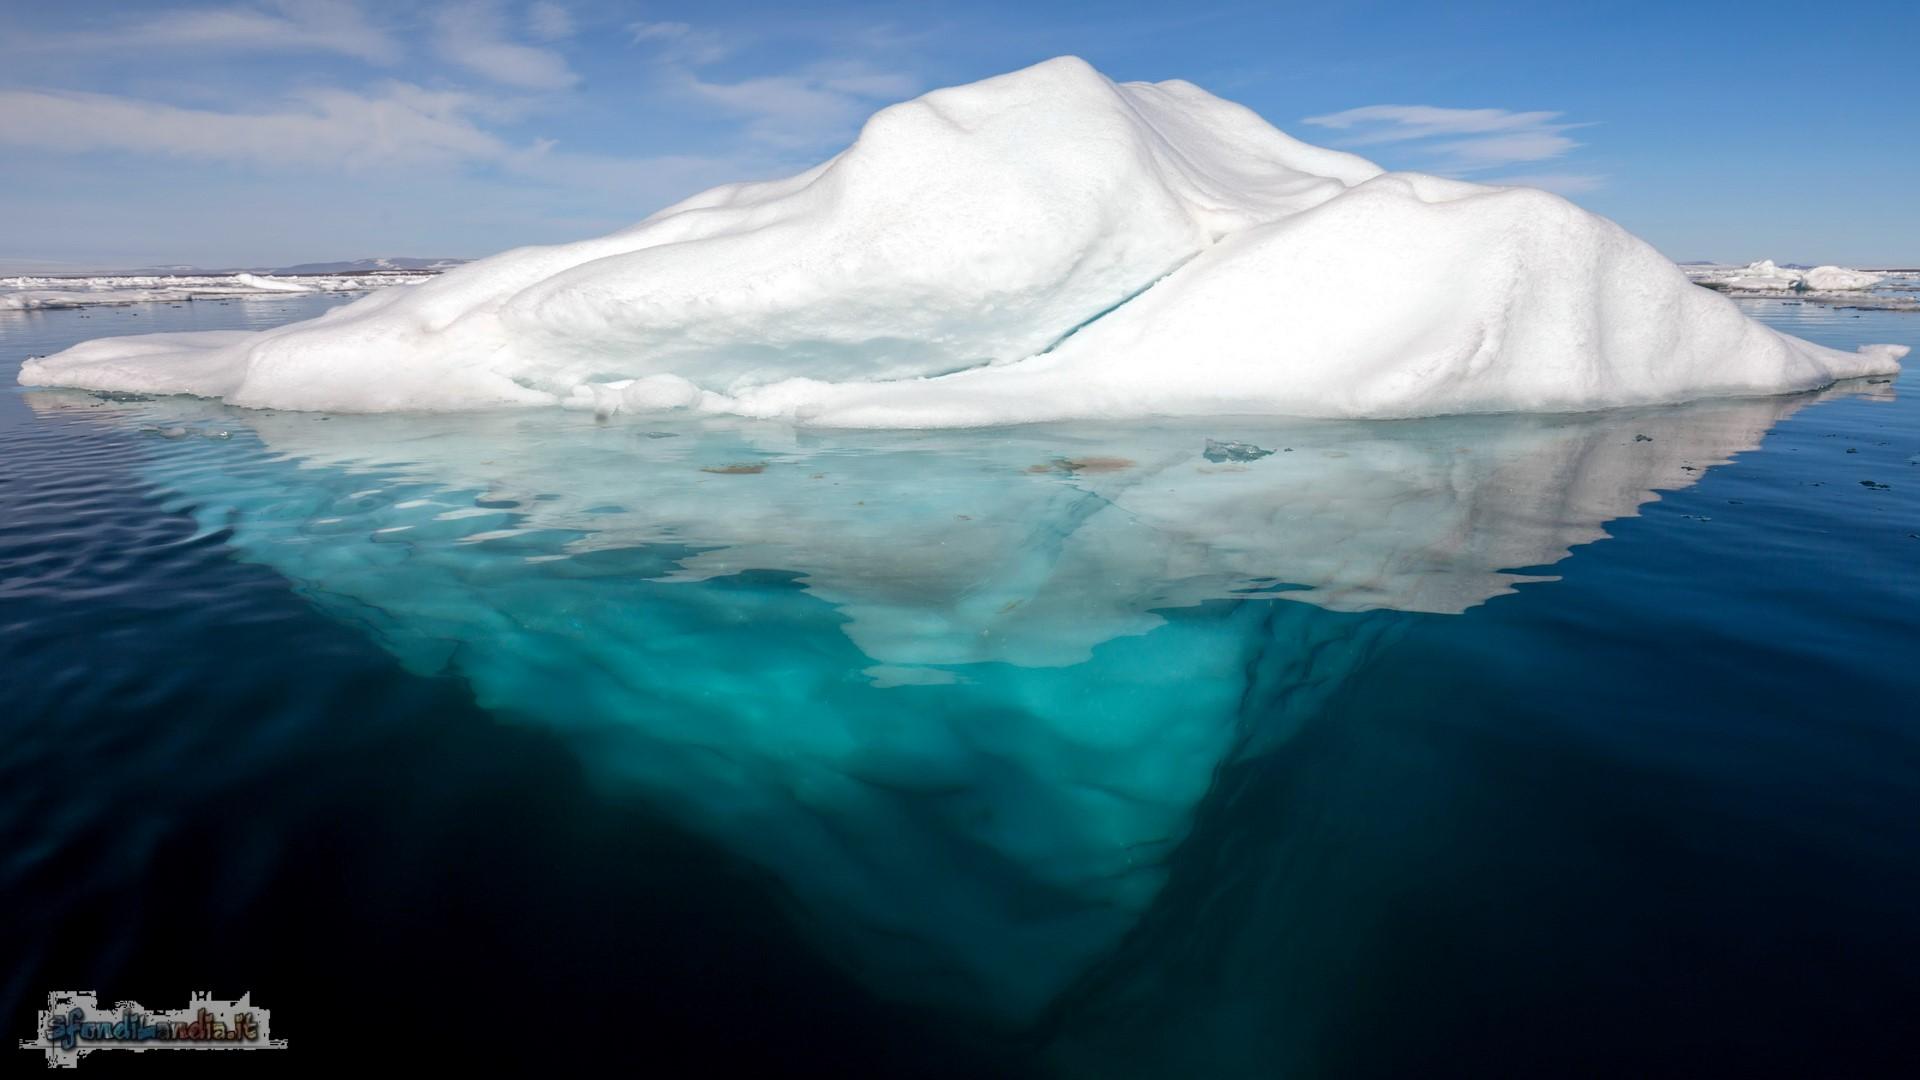 Artic Iceberg